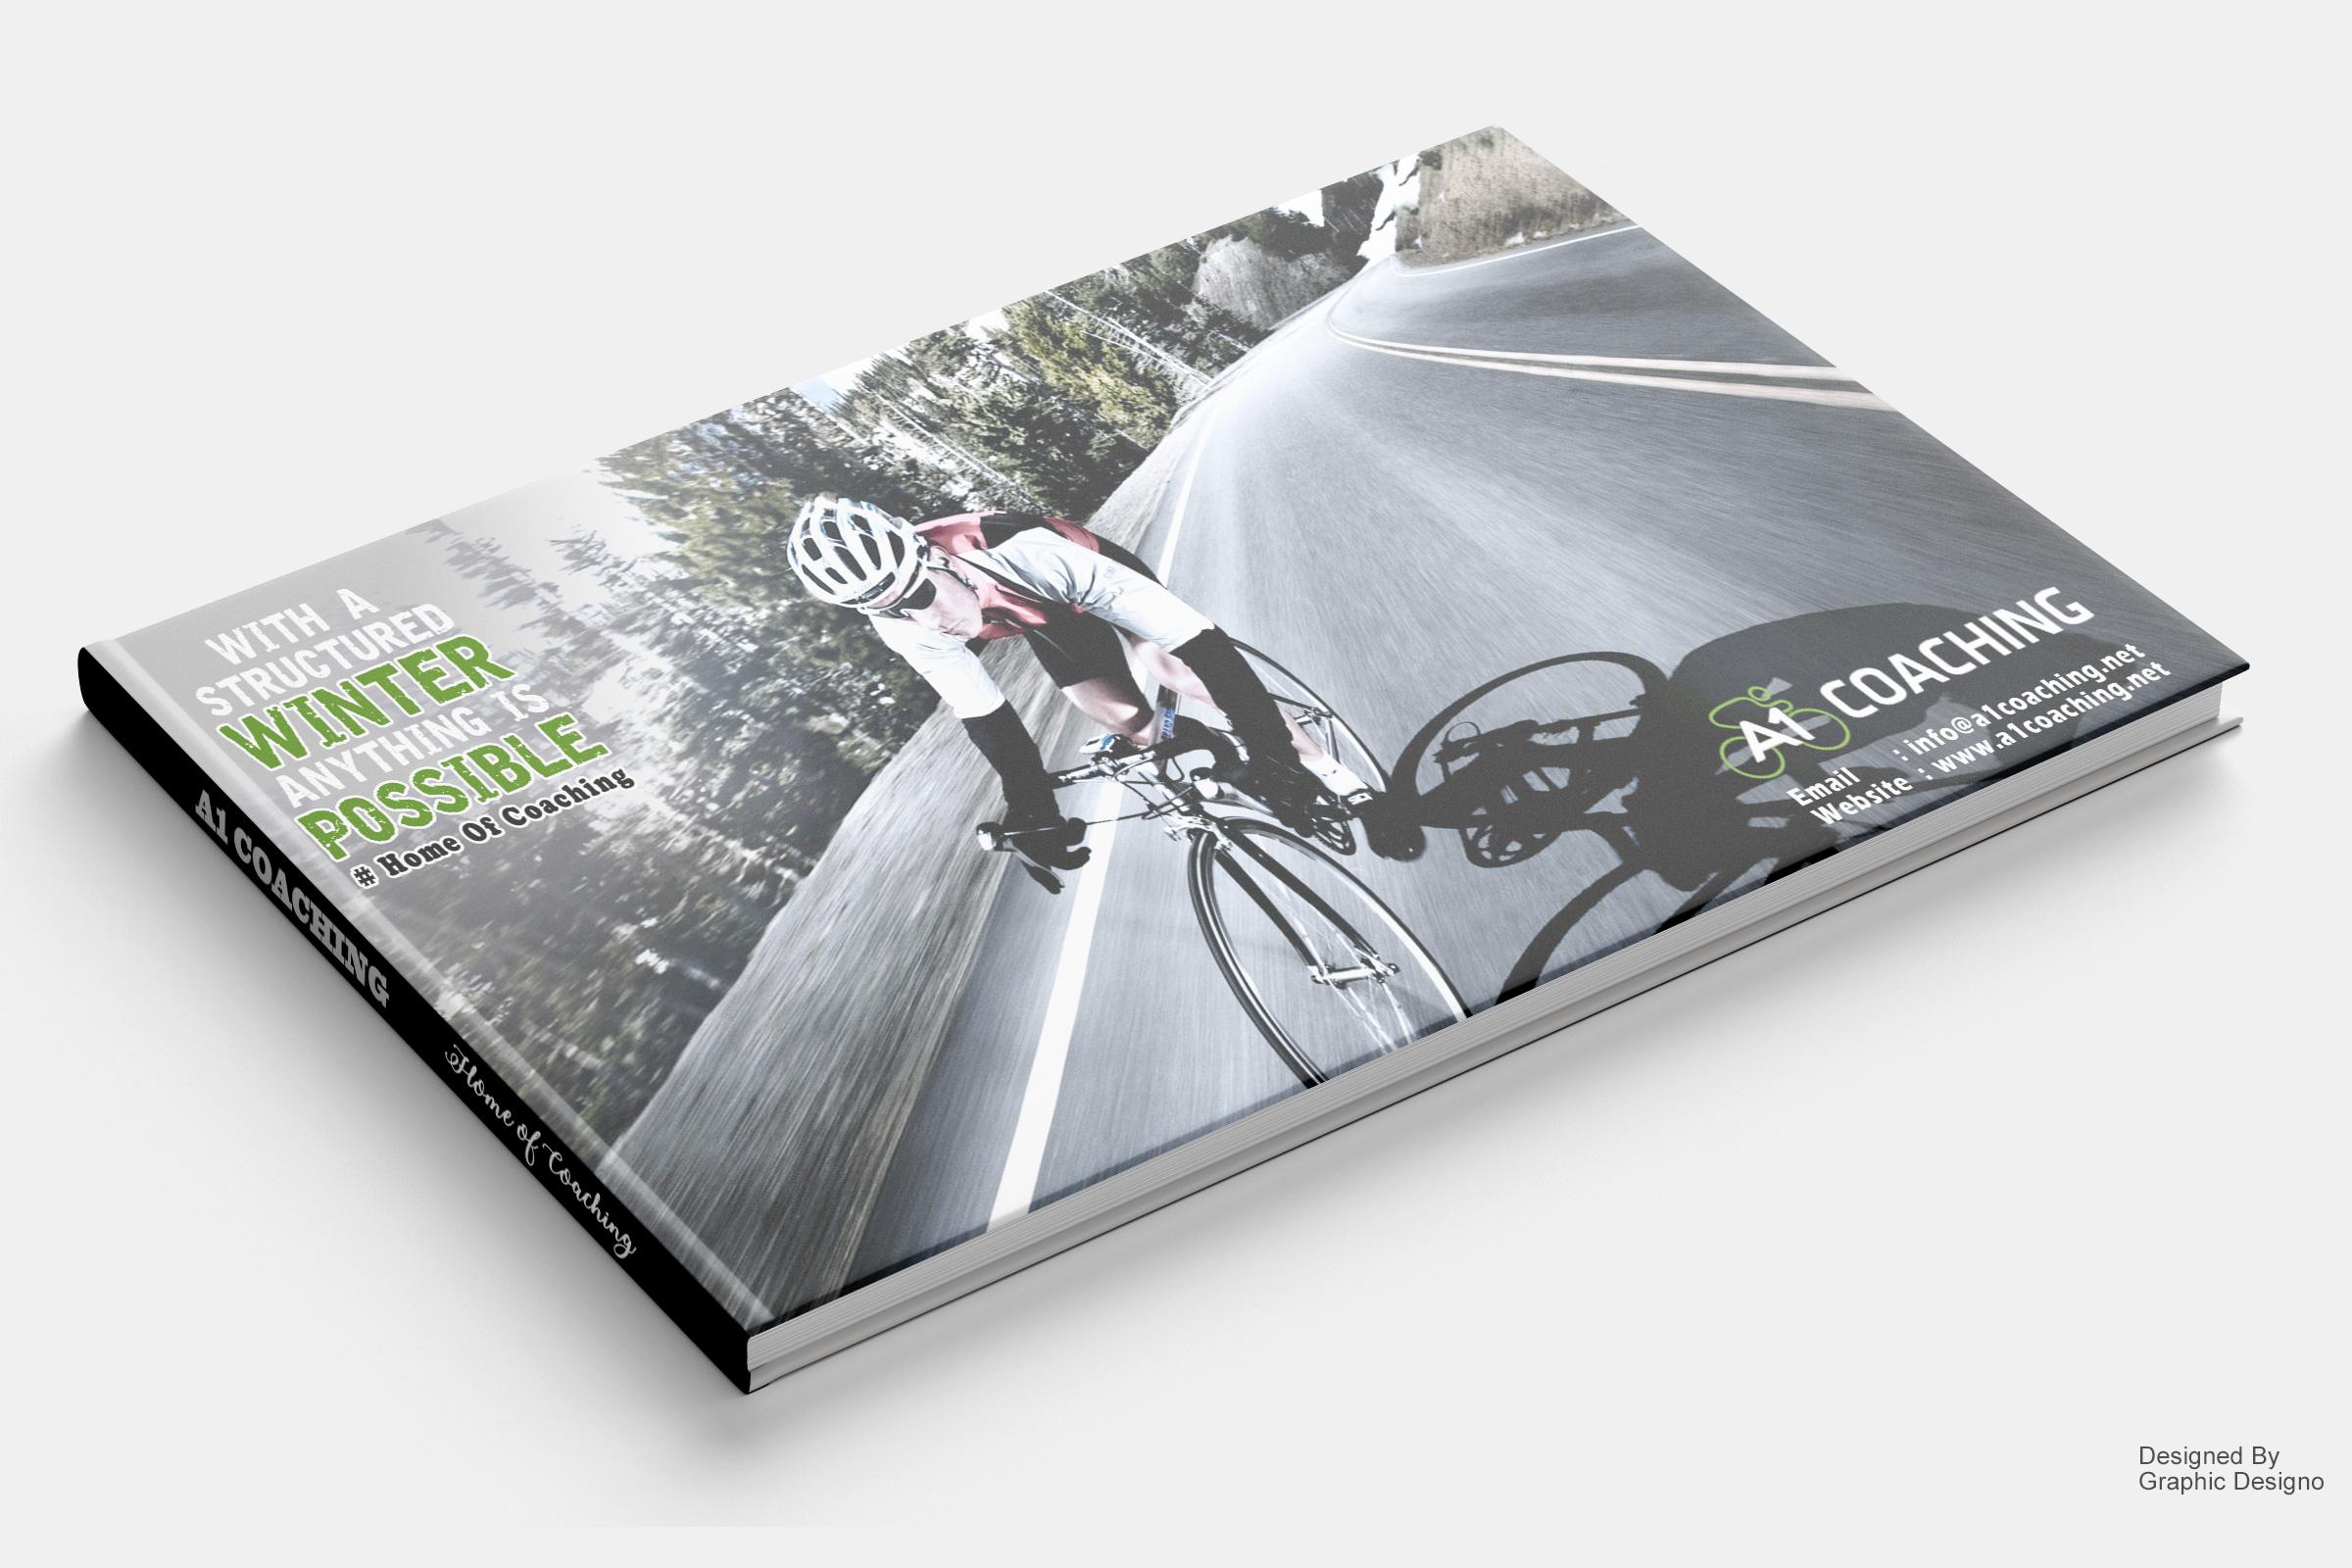 A1-coaching-book-cover